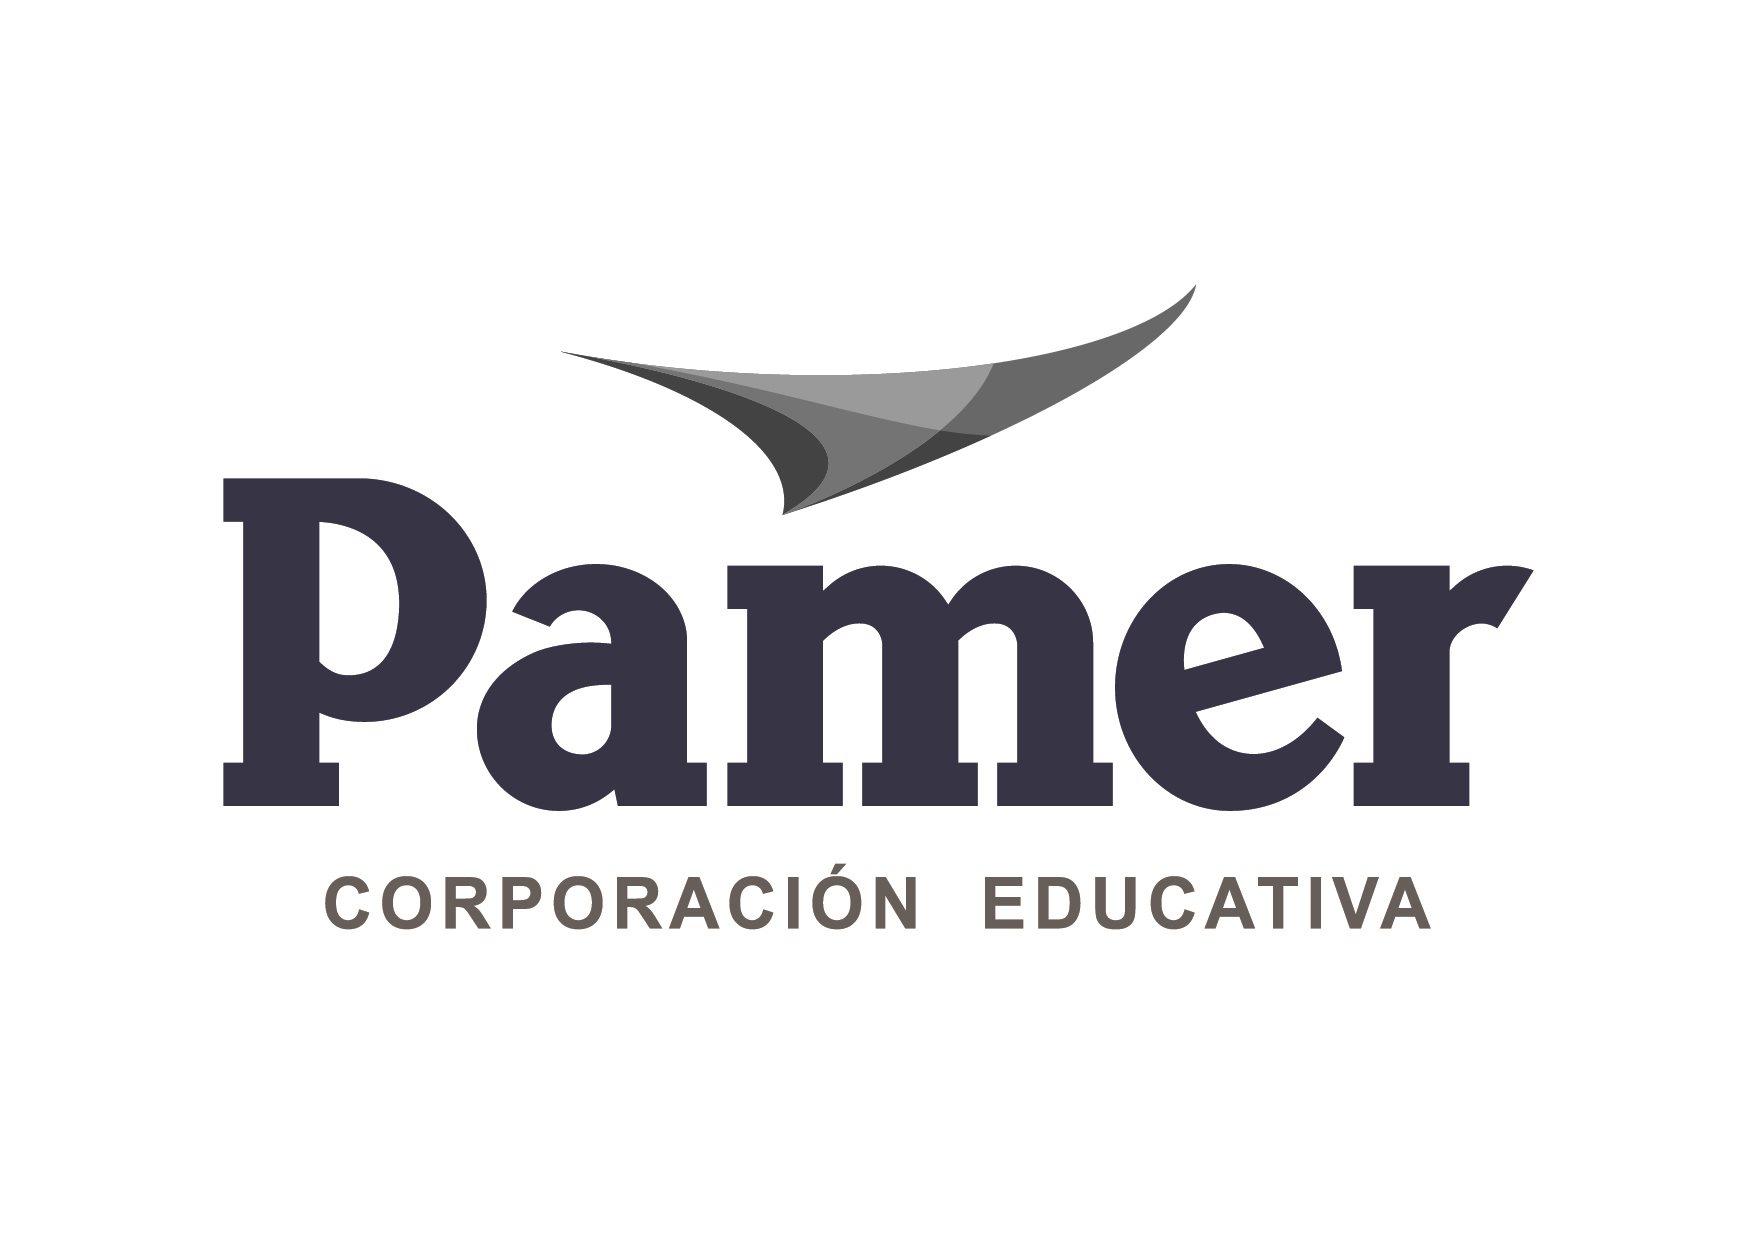 Corporación Educativa Pamer